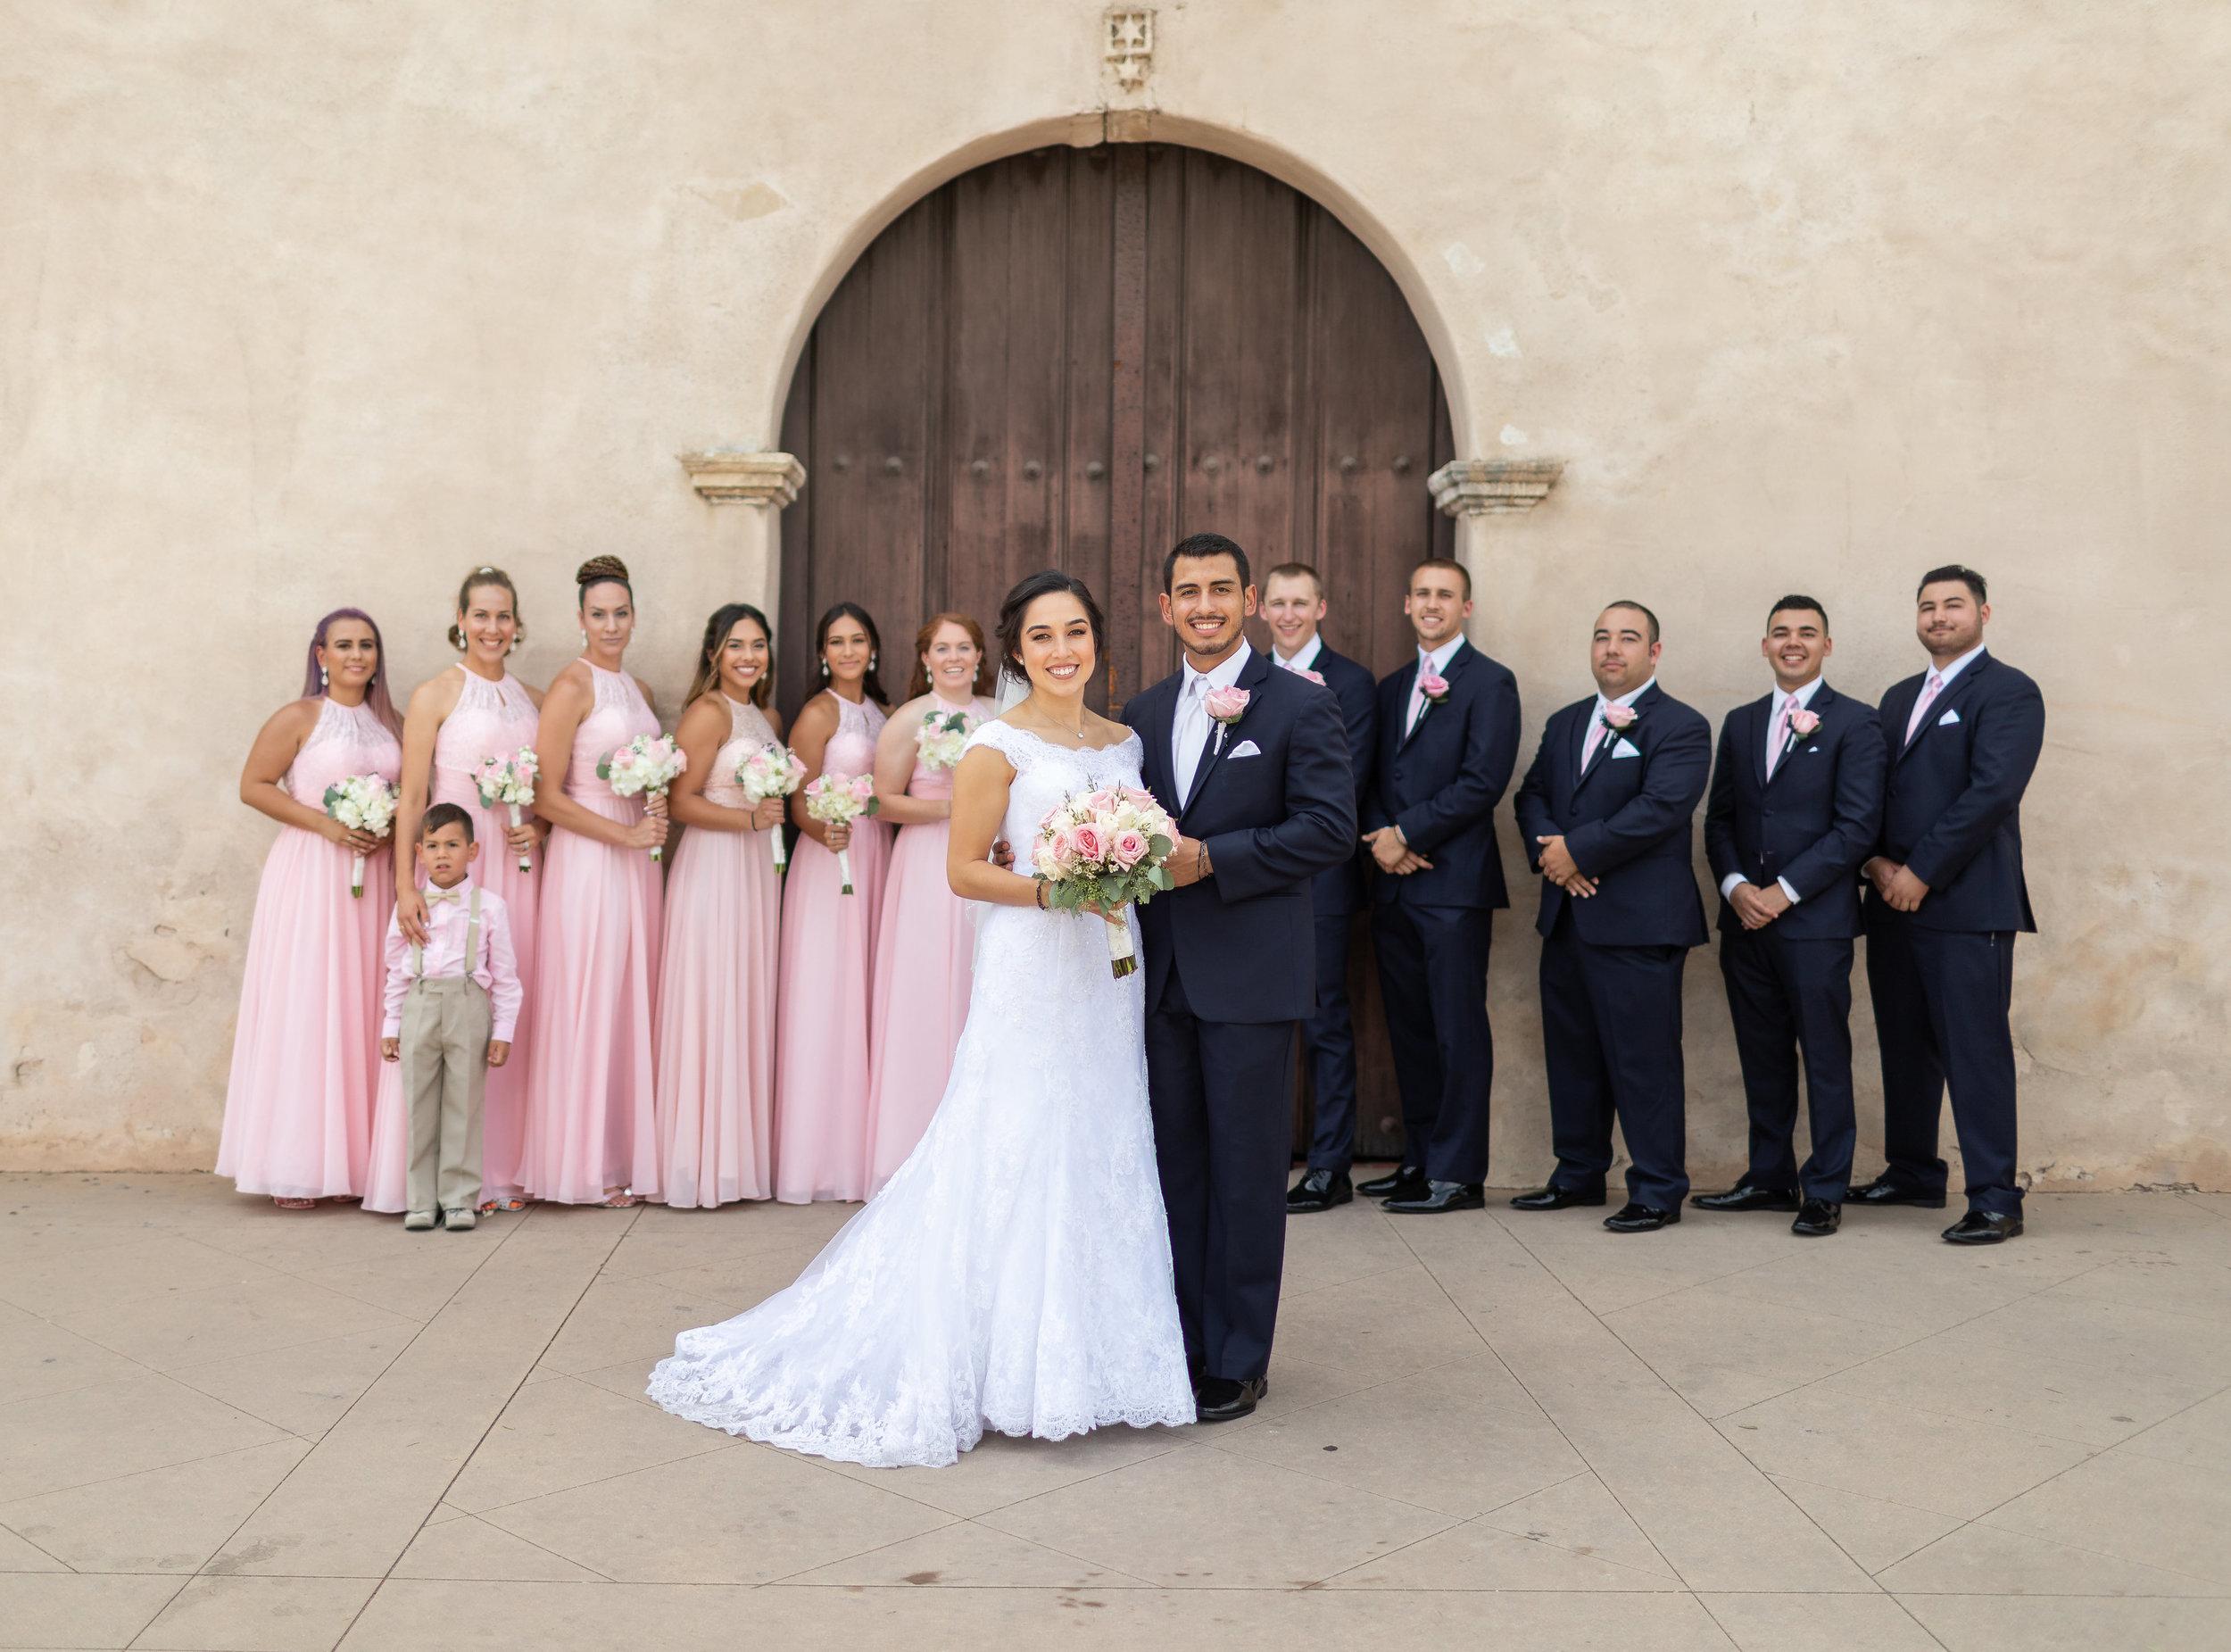 ! Wedding Party Photo at San Gabriel Mission.jpg